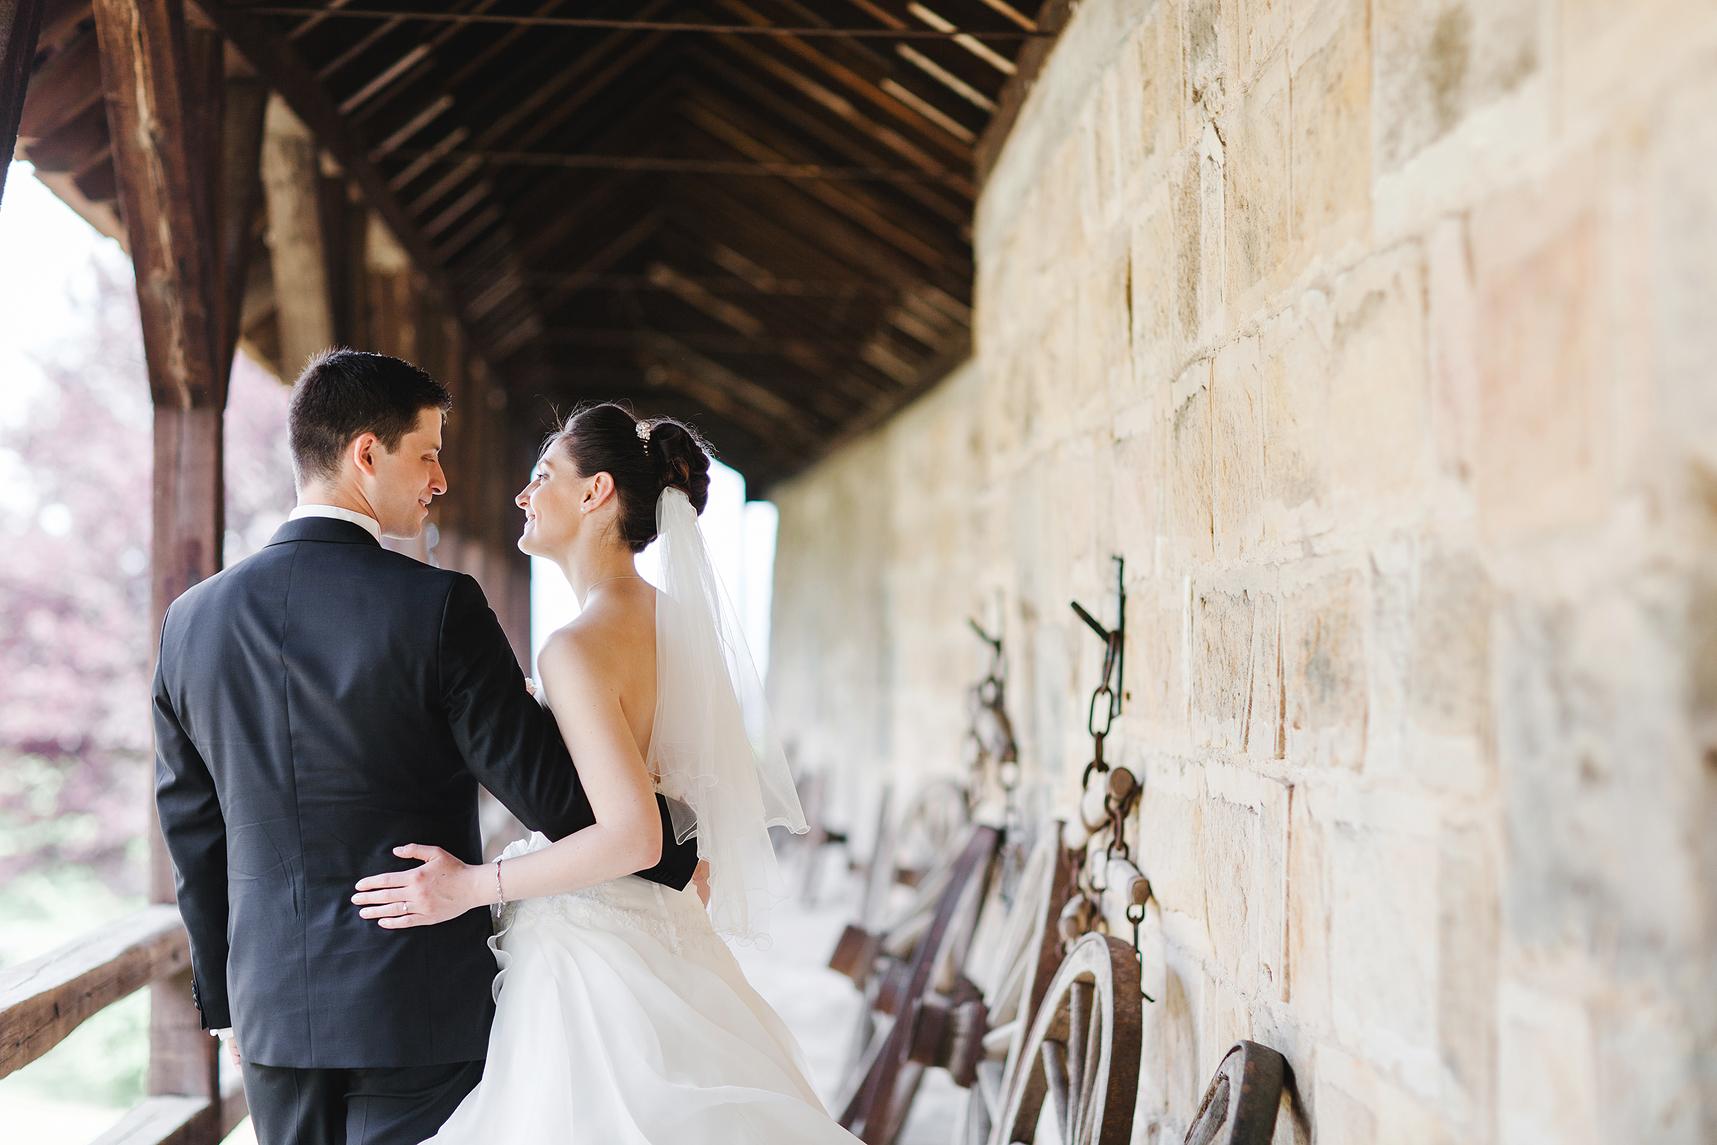 Hochzeitsfotograf Bamberg, Daria Gleich